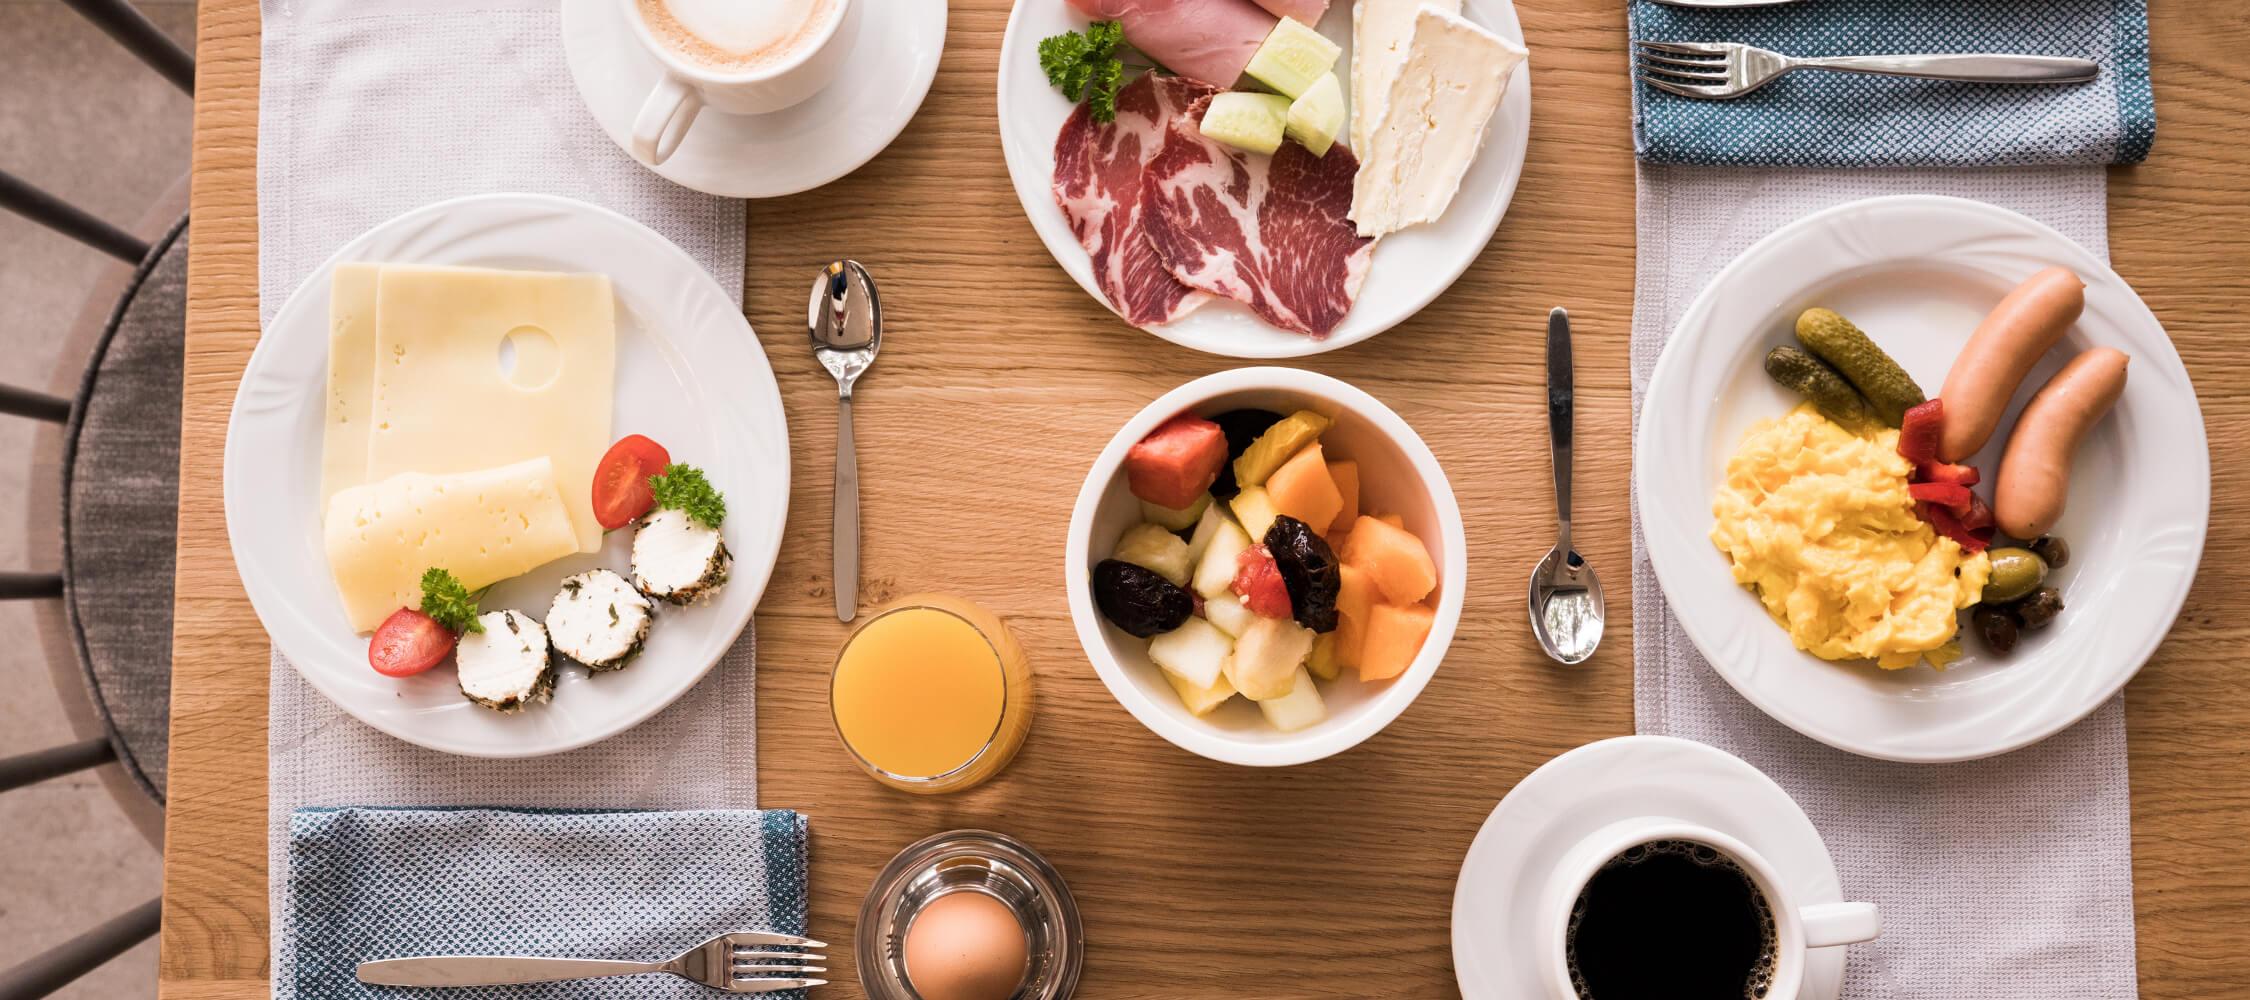 Hotel_Flora_Merano_Restaurant_Breakfast_Buffet_Fruehstueck_Essen_Brot_bHotel_Flora_Merano_Restaurant_Breakfast_Buffet_Fruehstueck_Essen_2_BeatricePilotto_DSC03620_2250x1000